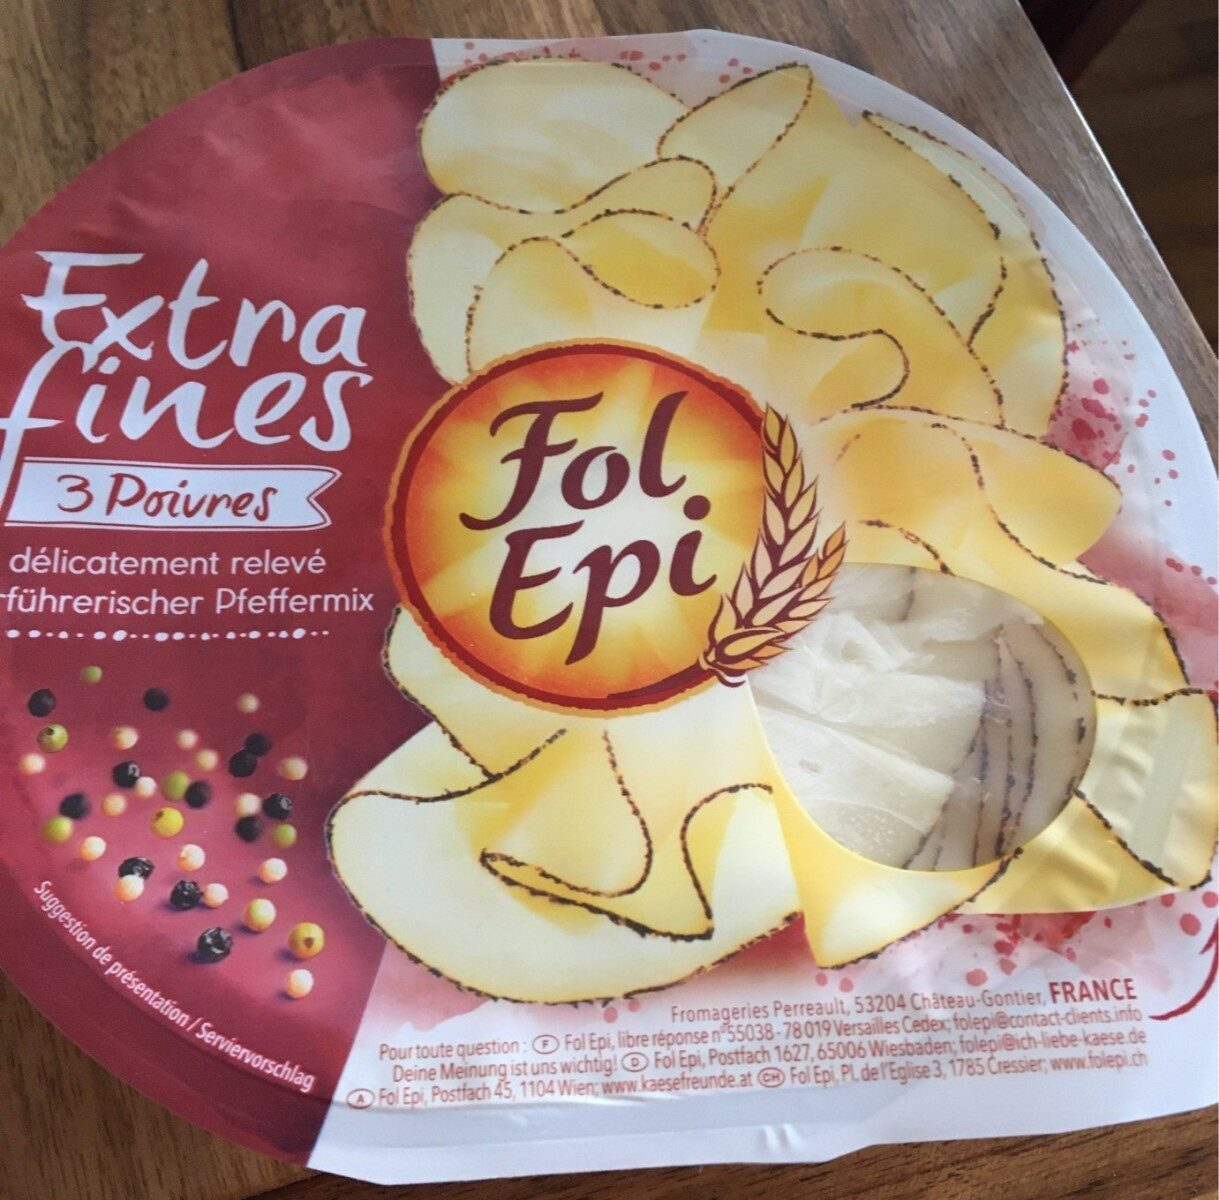 Fol epi extra fines 3 poivres - Produit - fr